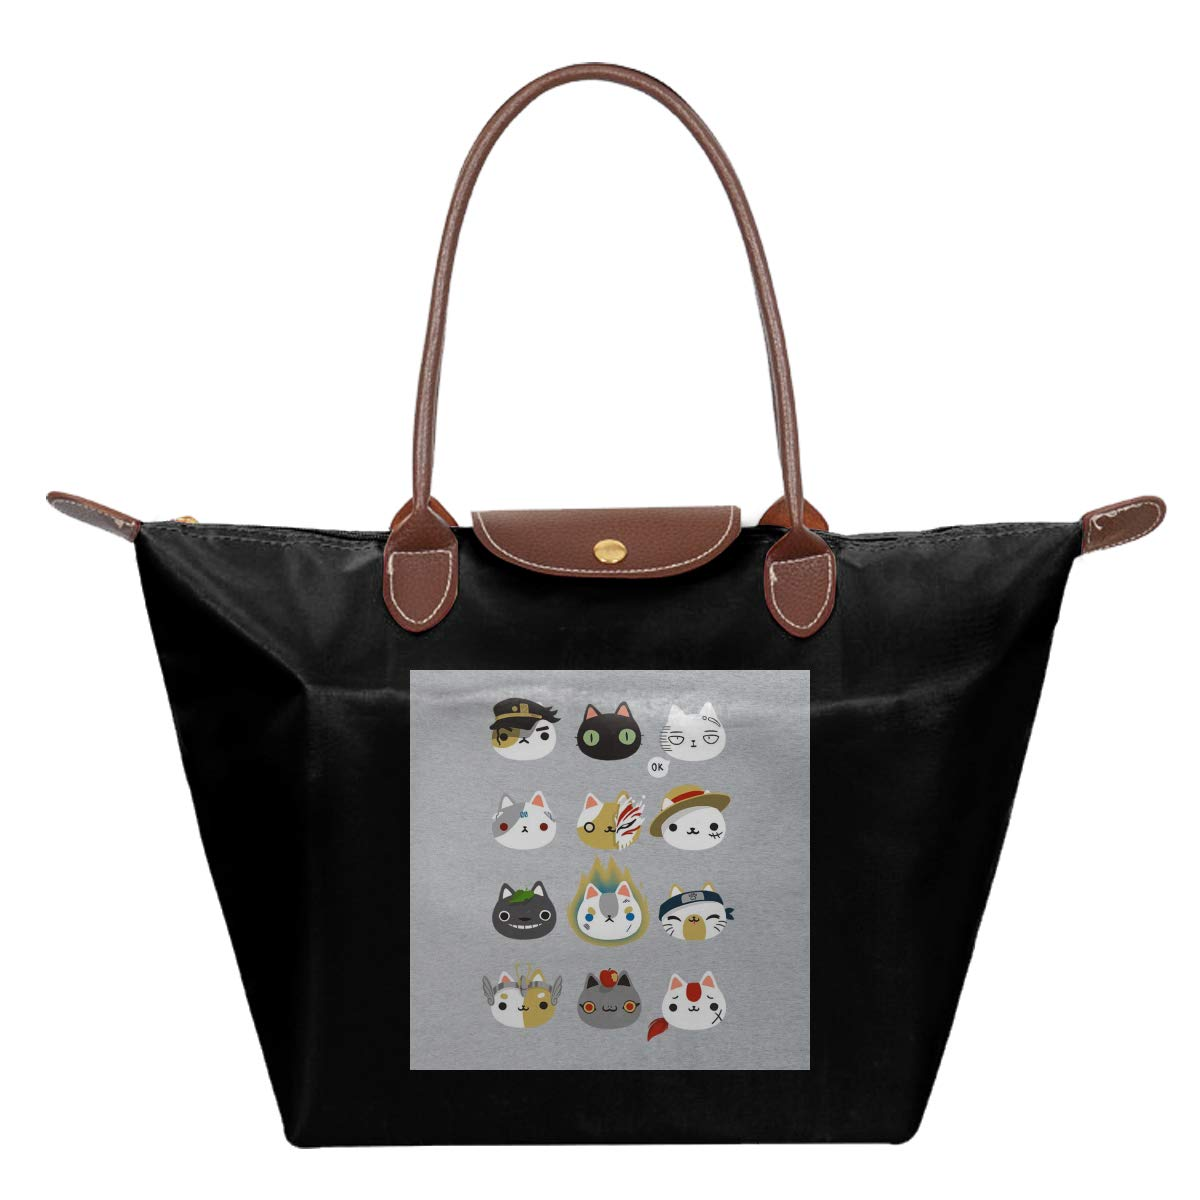 Cosplay Cats Waterproof Leather Folded Messenger Nylon Bag Travel Tote Hopping Folding School Handbags